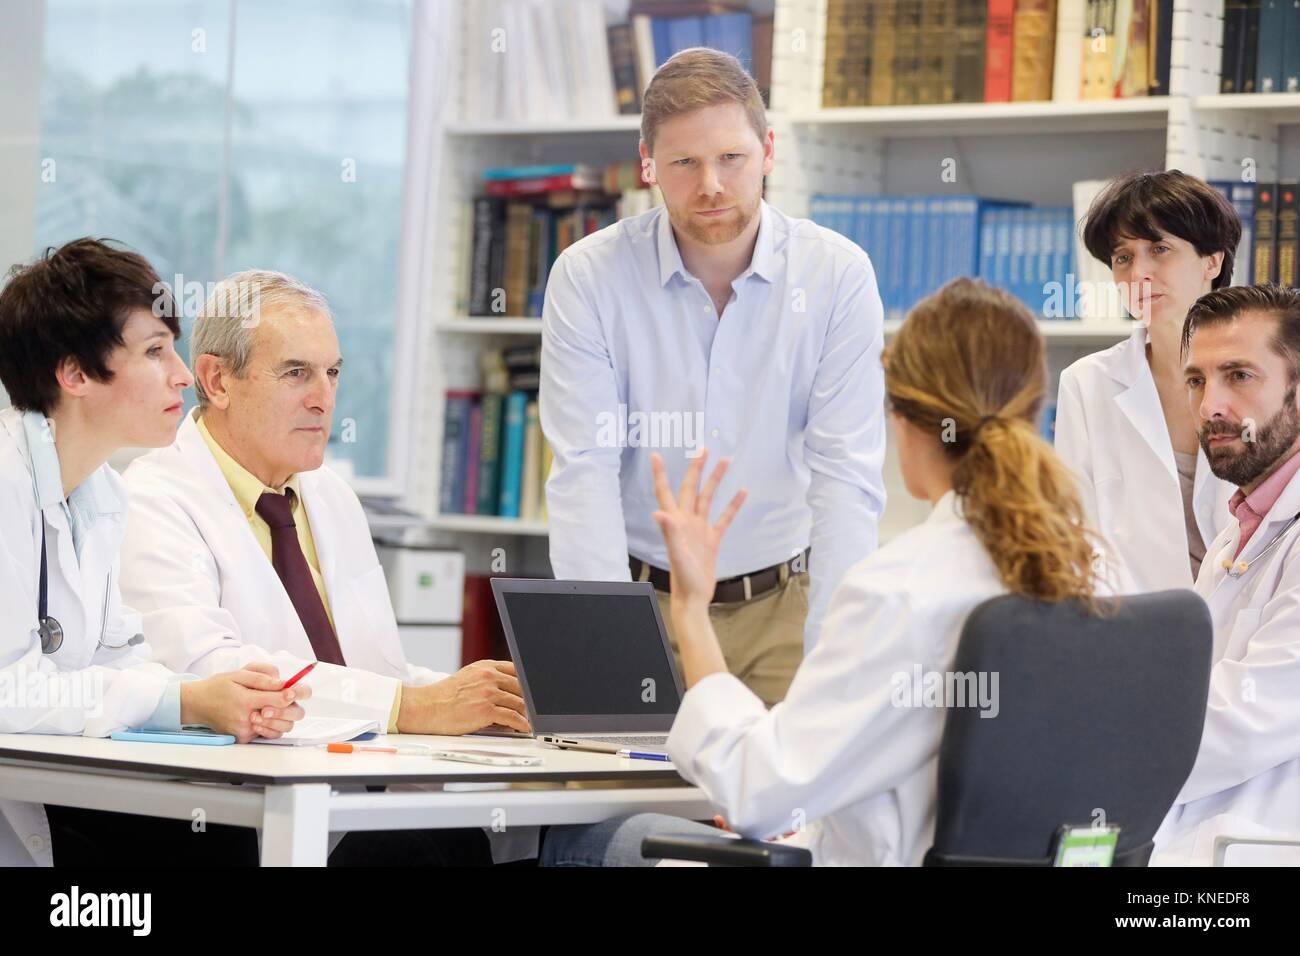 Salesman at doctors´ meeting, clinical session, Hospital, Donostia, San Sebastian, Gipuzkoa, Basque Country, - Stock Image